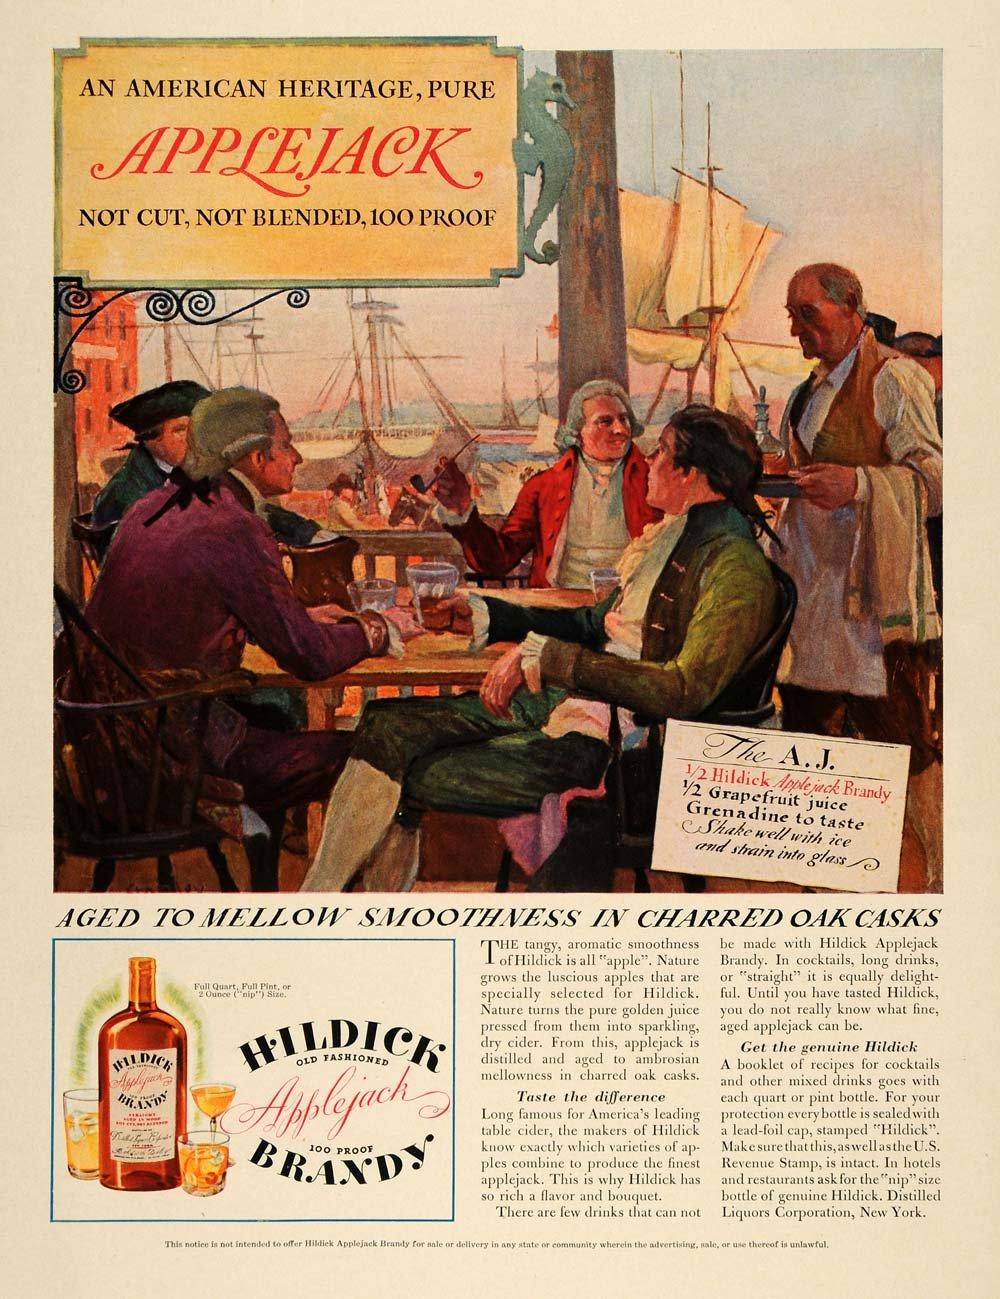 1934 Ad Hildick Applejack Brandy advertisement